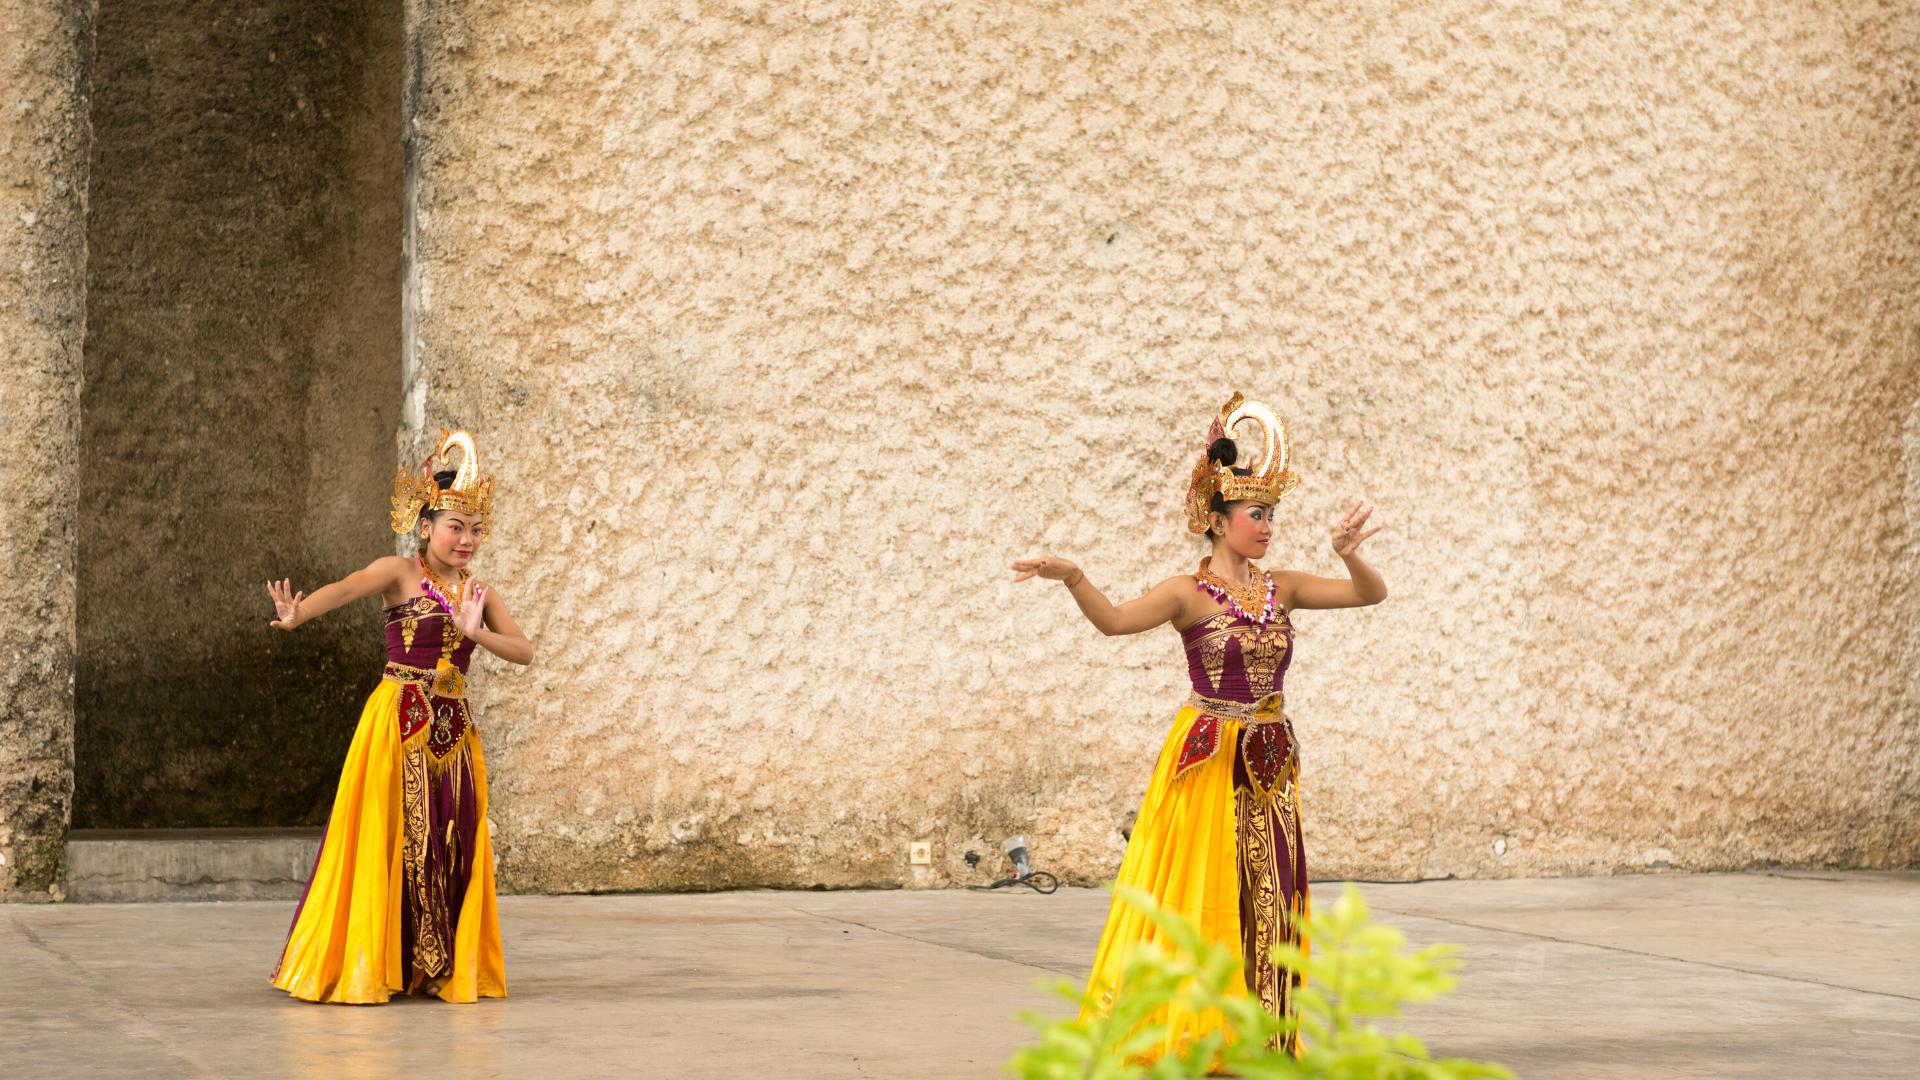 DestinationTEFL_Bali_9